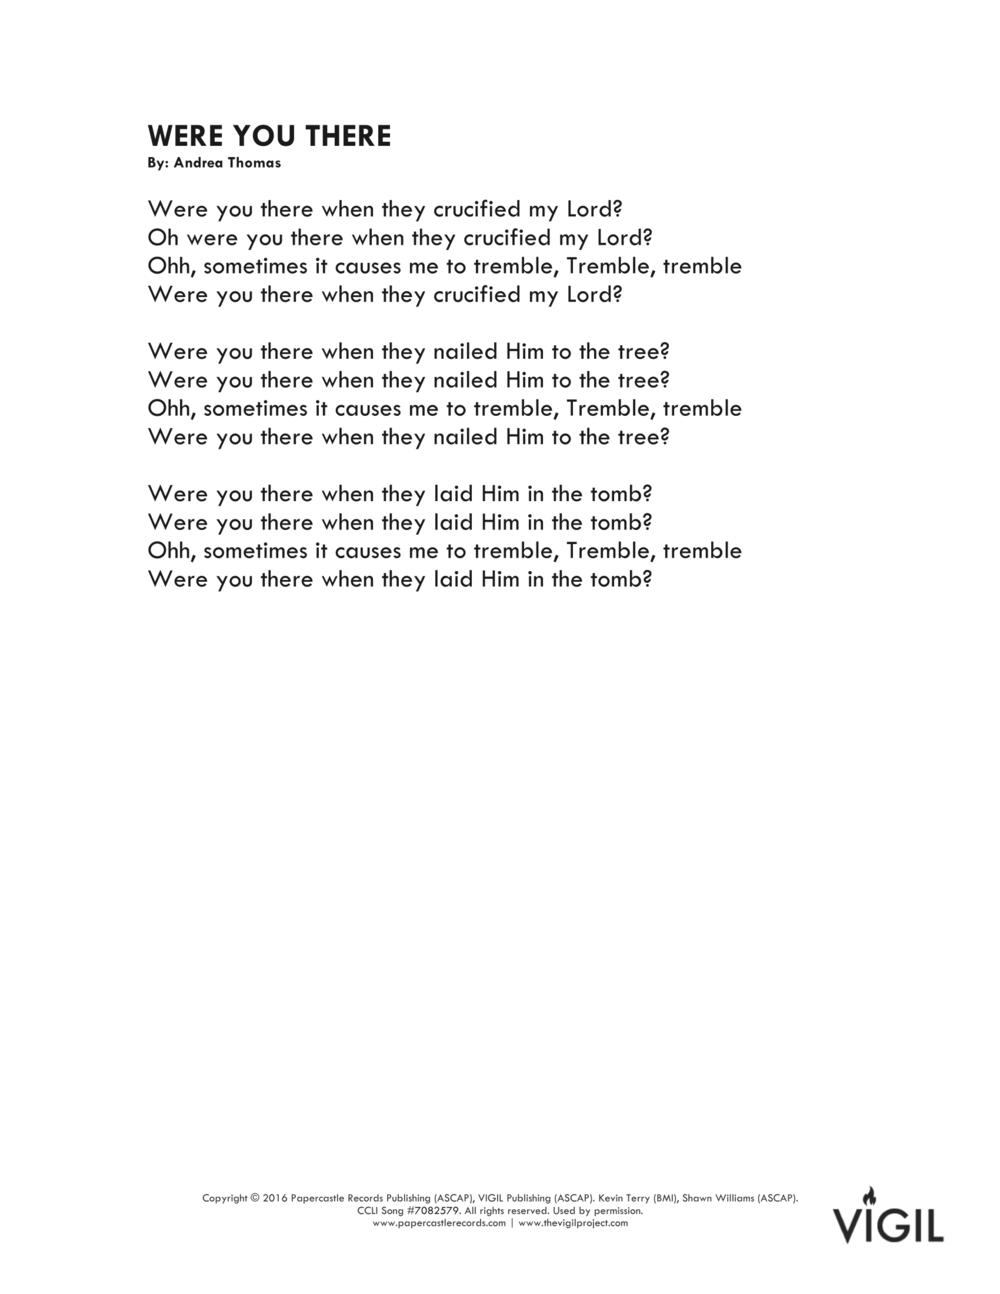 VIGIL S1 - Were You There (Lyrics)-1.png